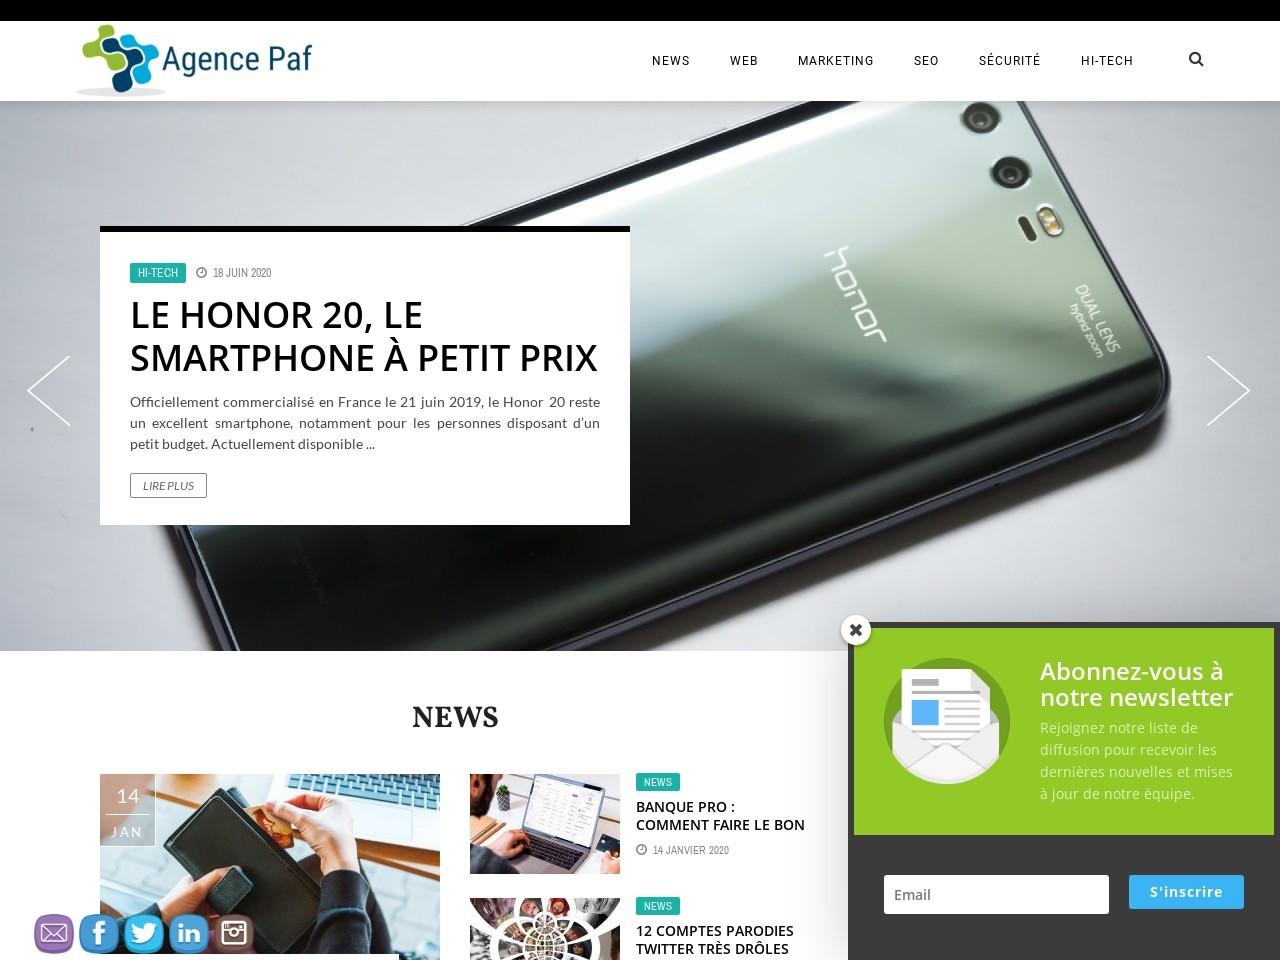 agence-paf.net